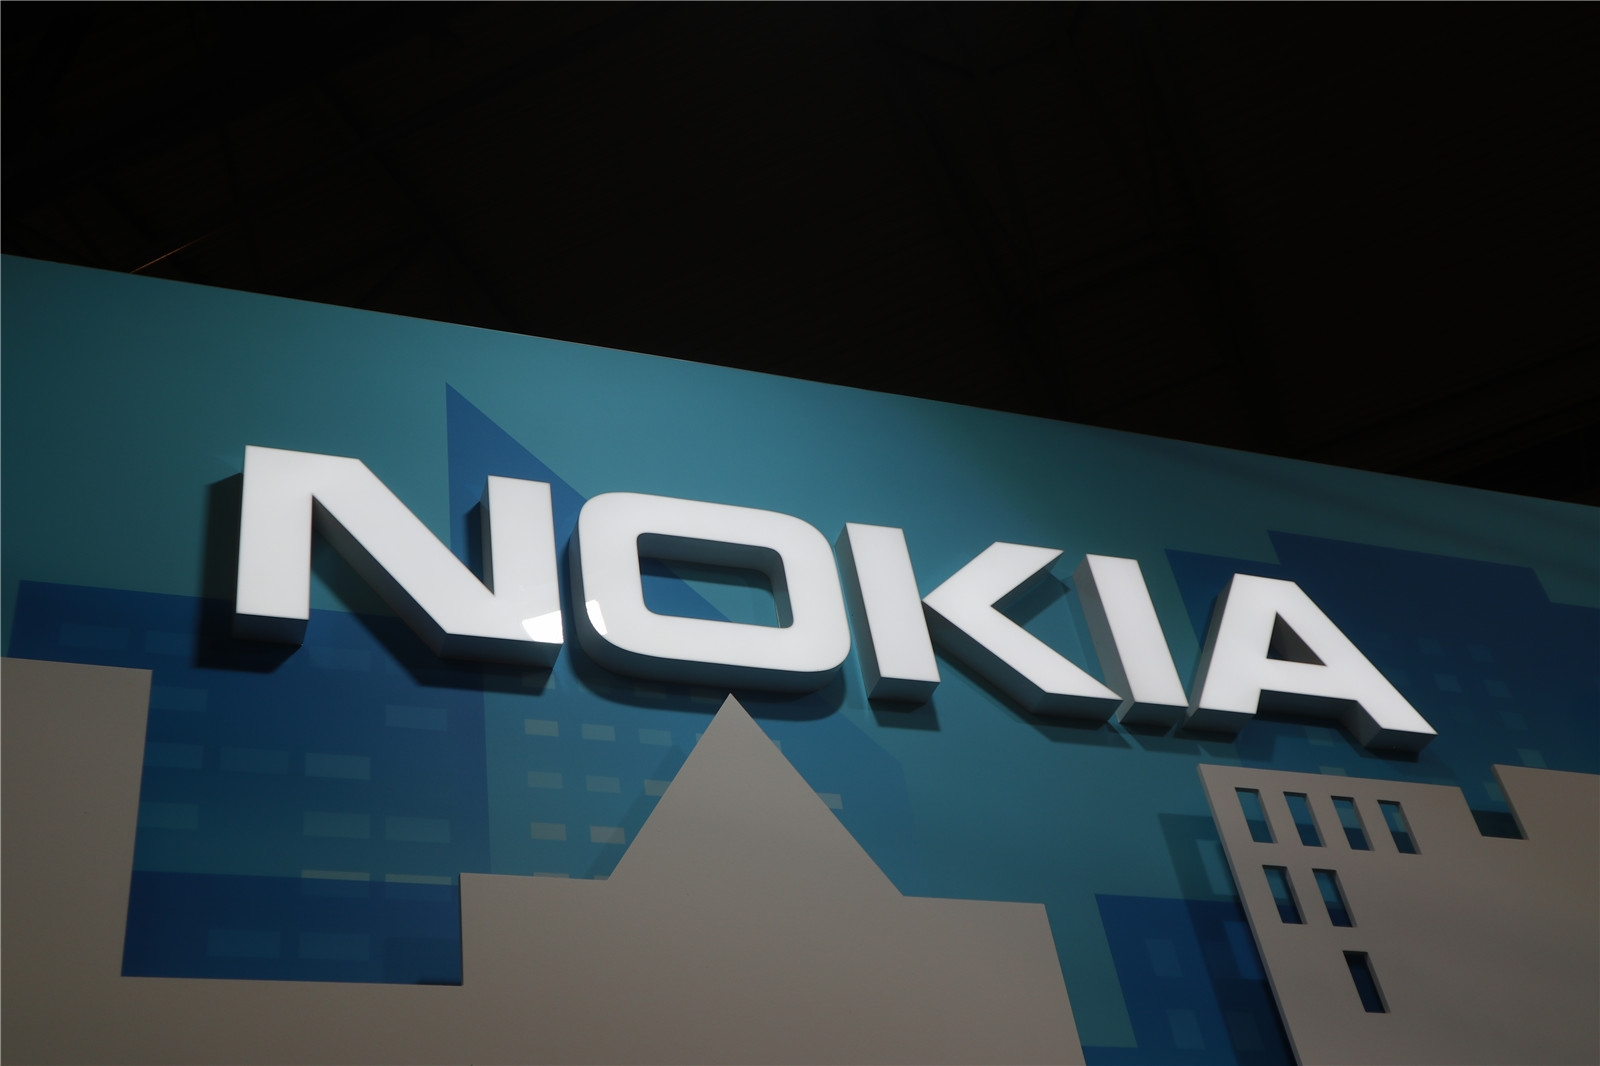 Nokia全新升级中端机曝出,预估Q3公布,市场价249欧元